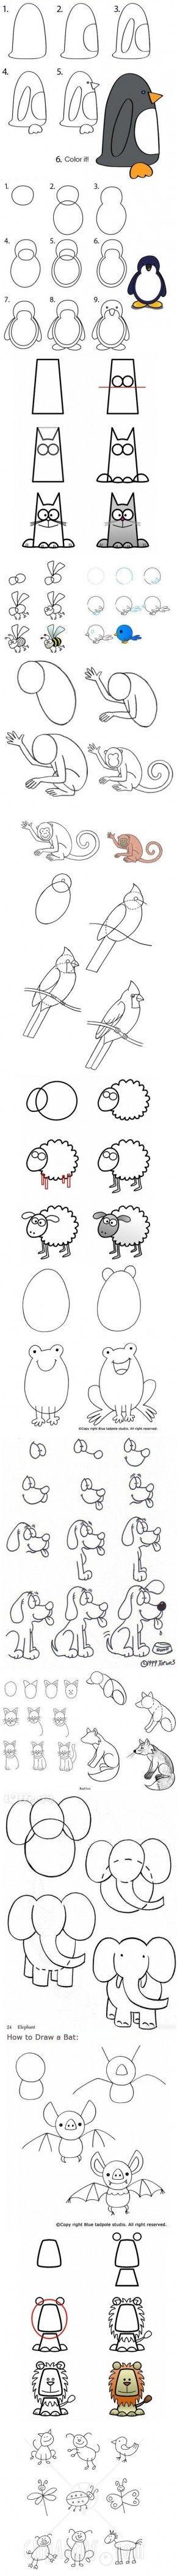 simpele diervormen